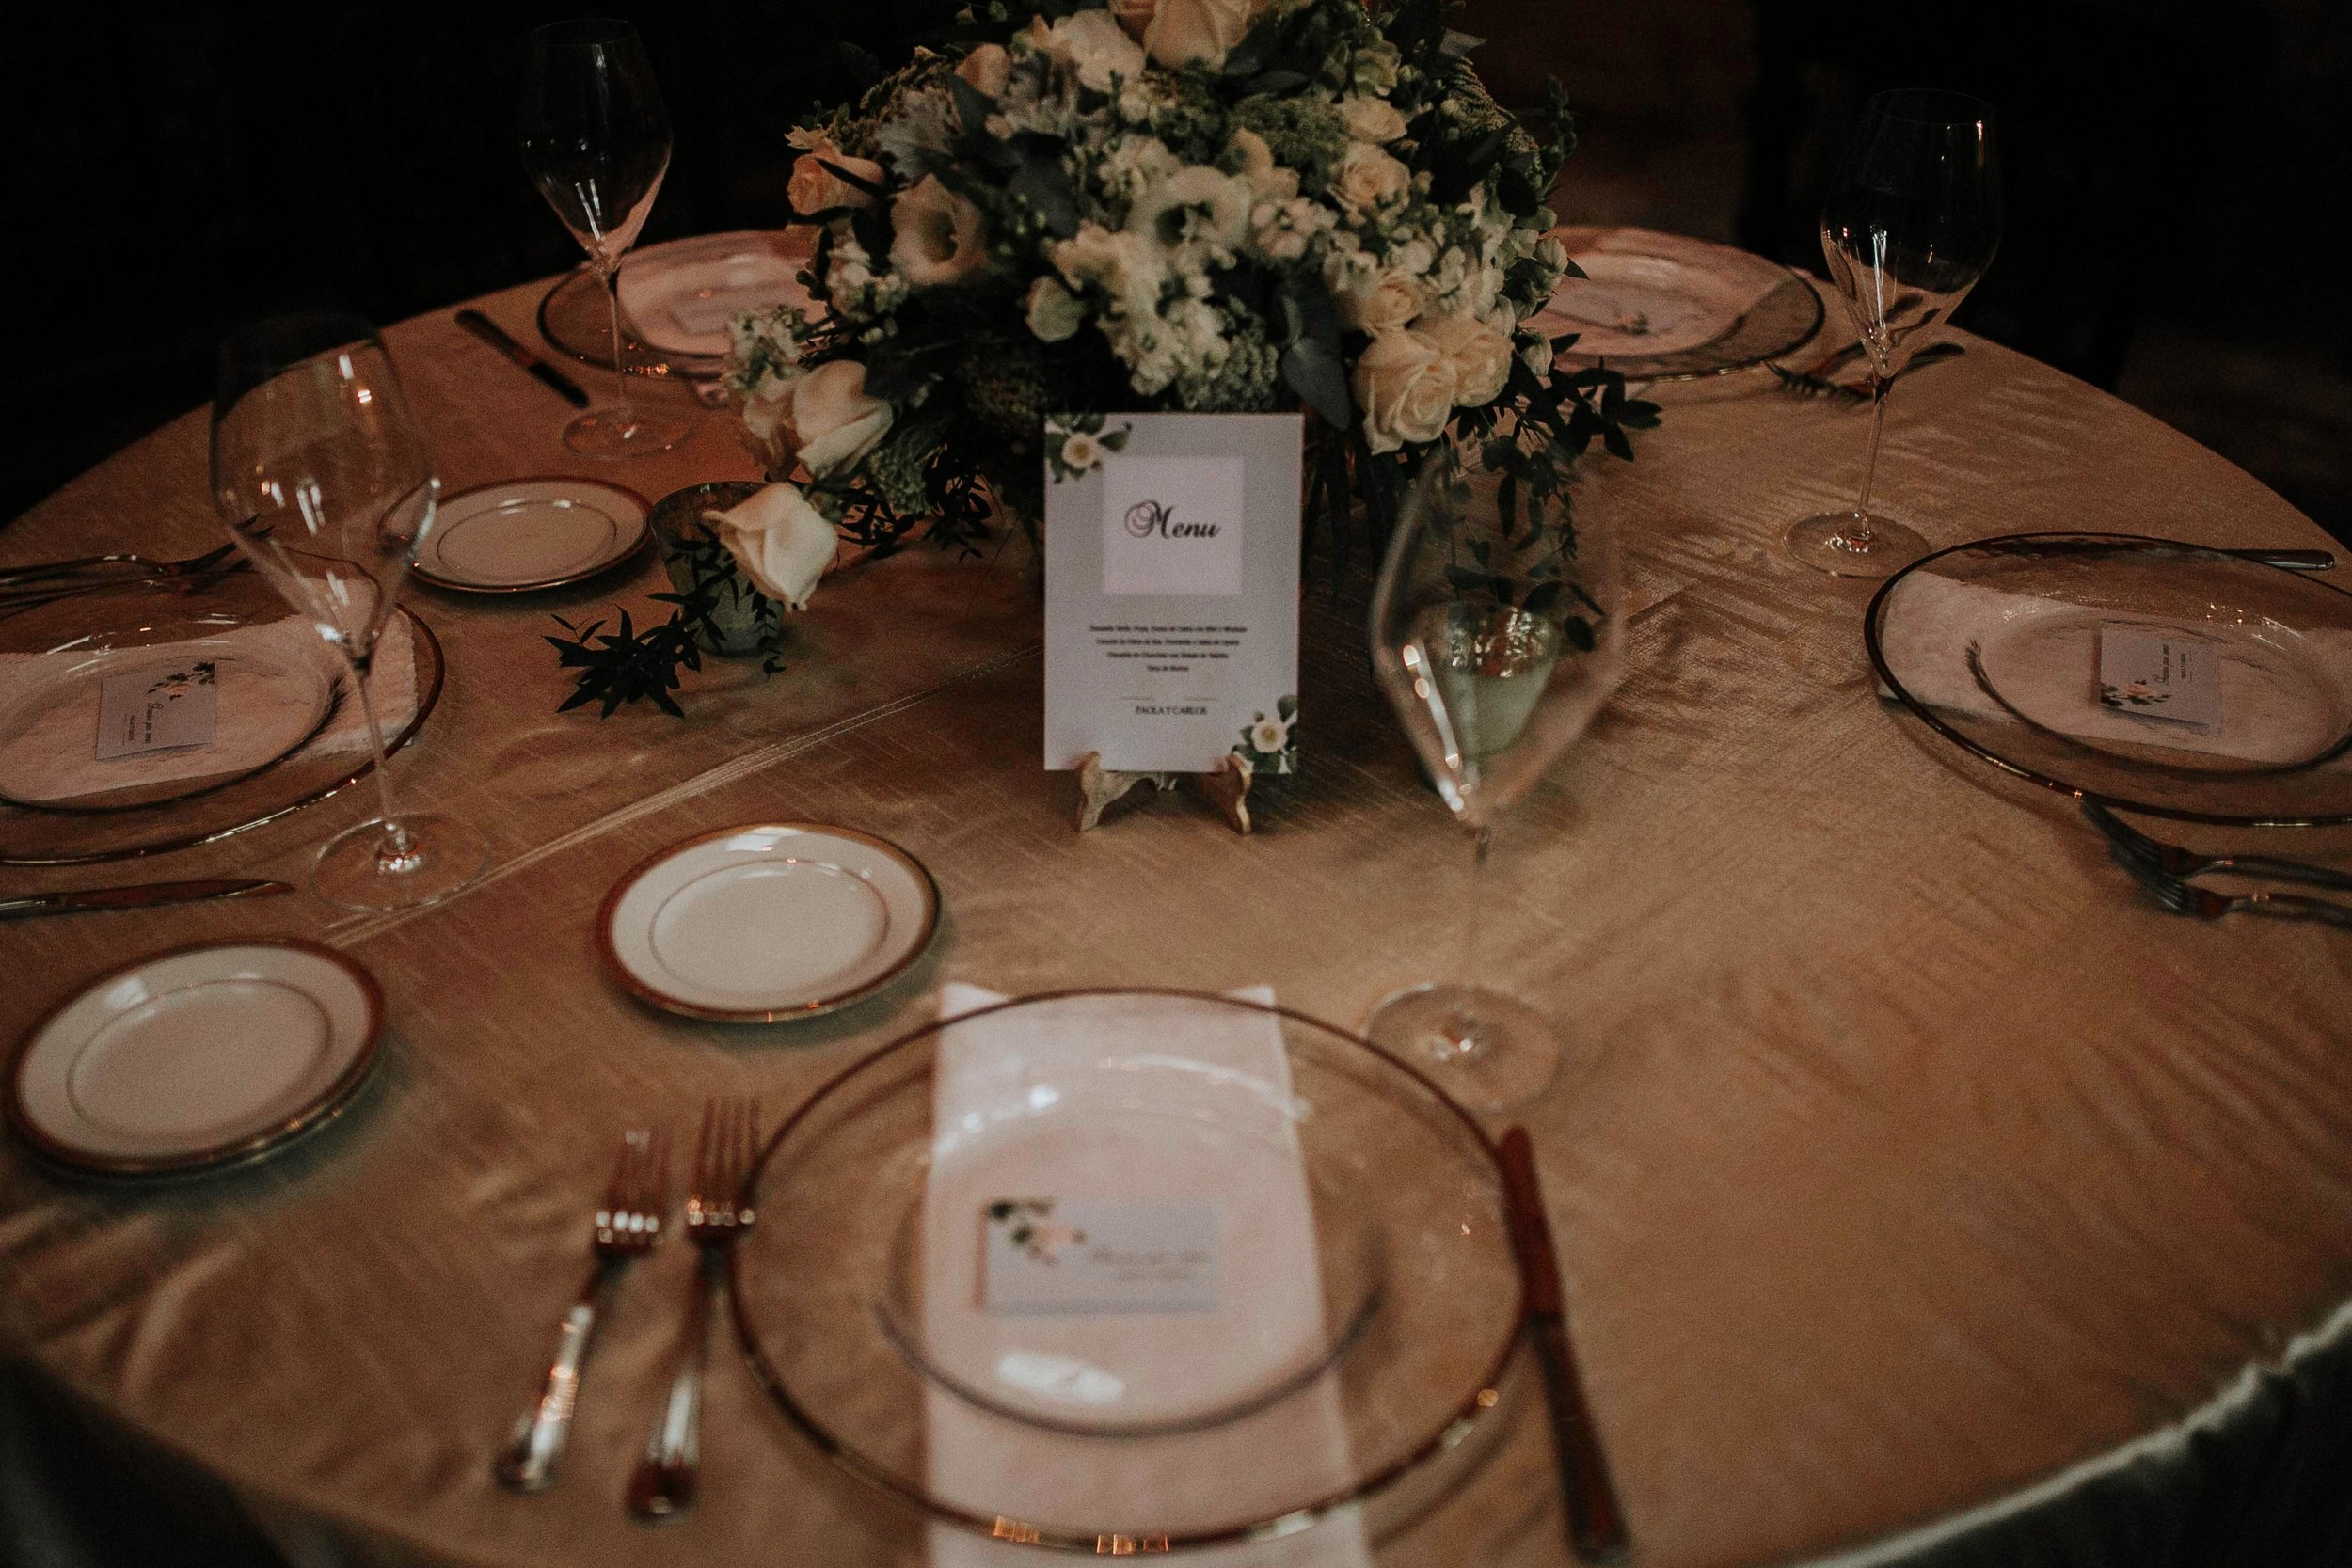 643A1934-Editaralfonso_flores_destination_wedding_photographer_San_gabriel_de_las_palmas.jpg